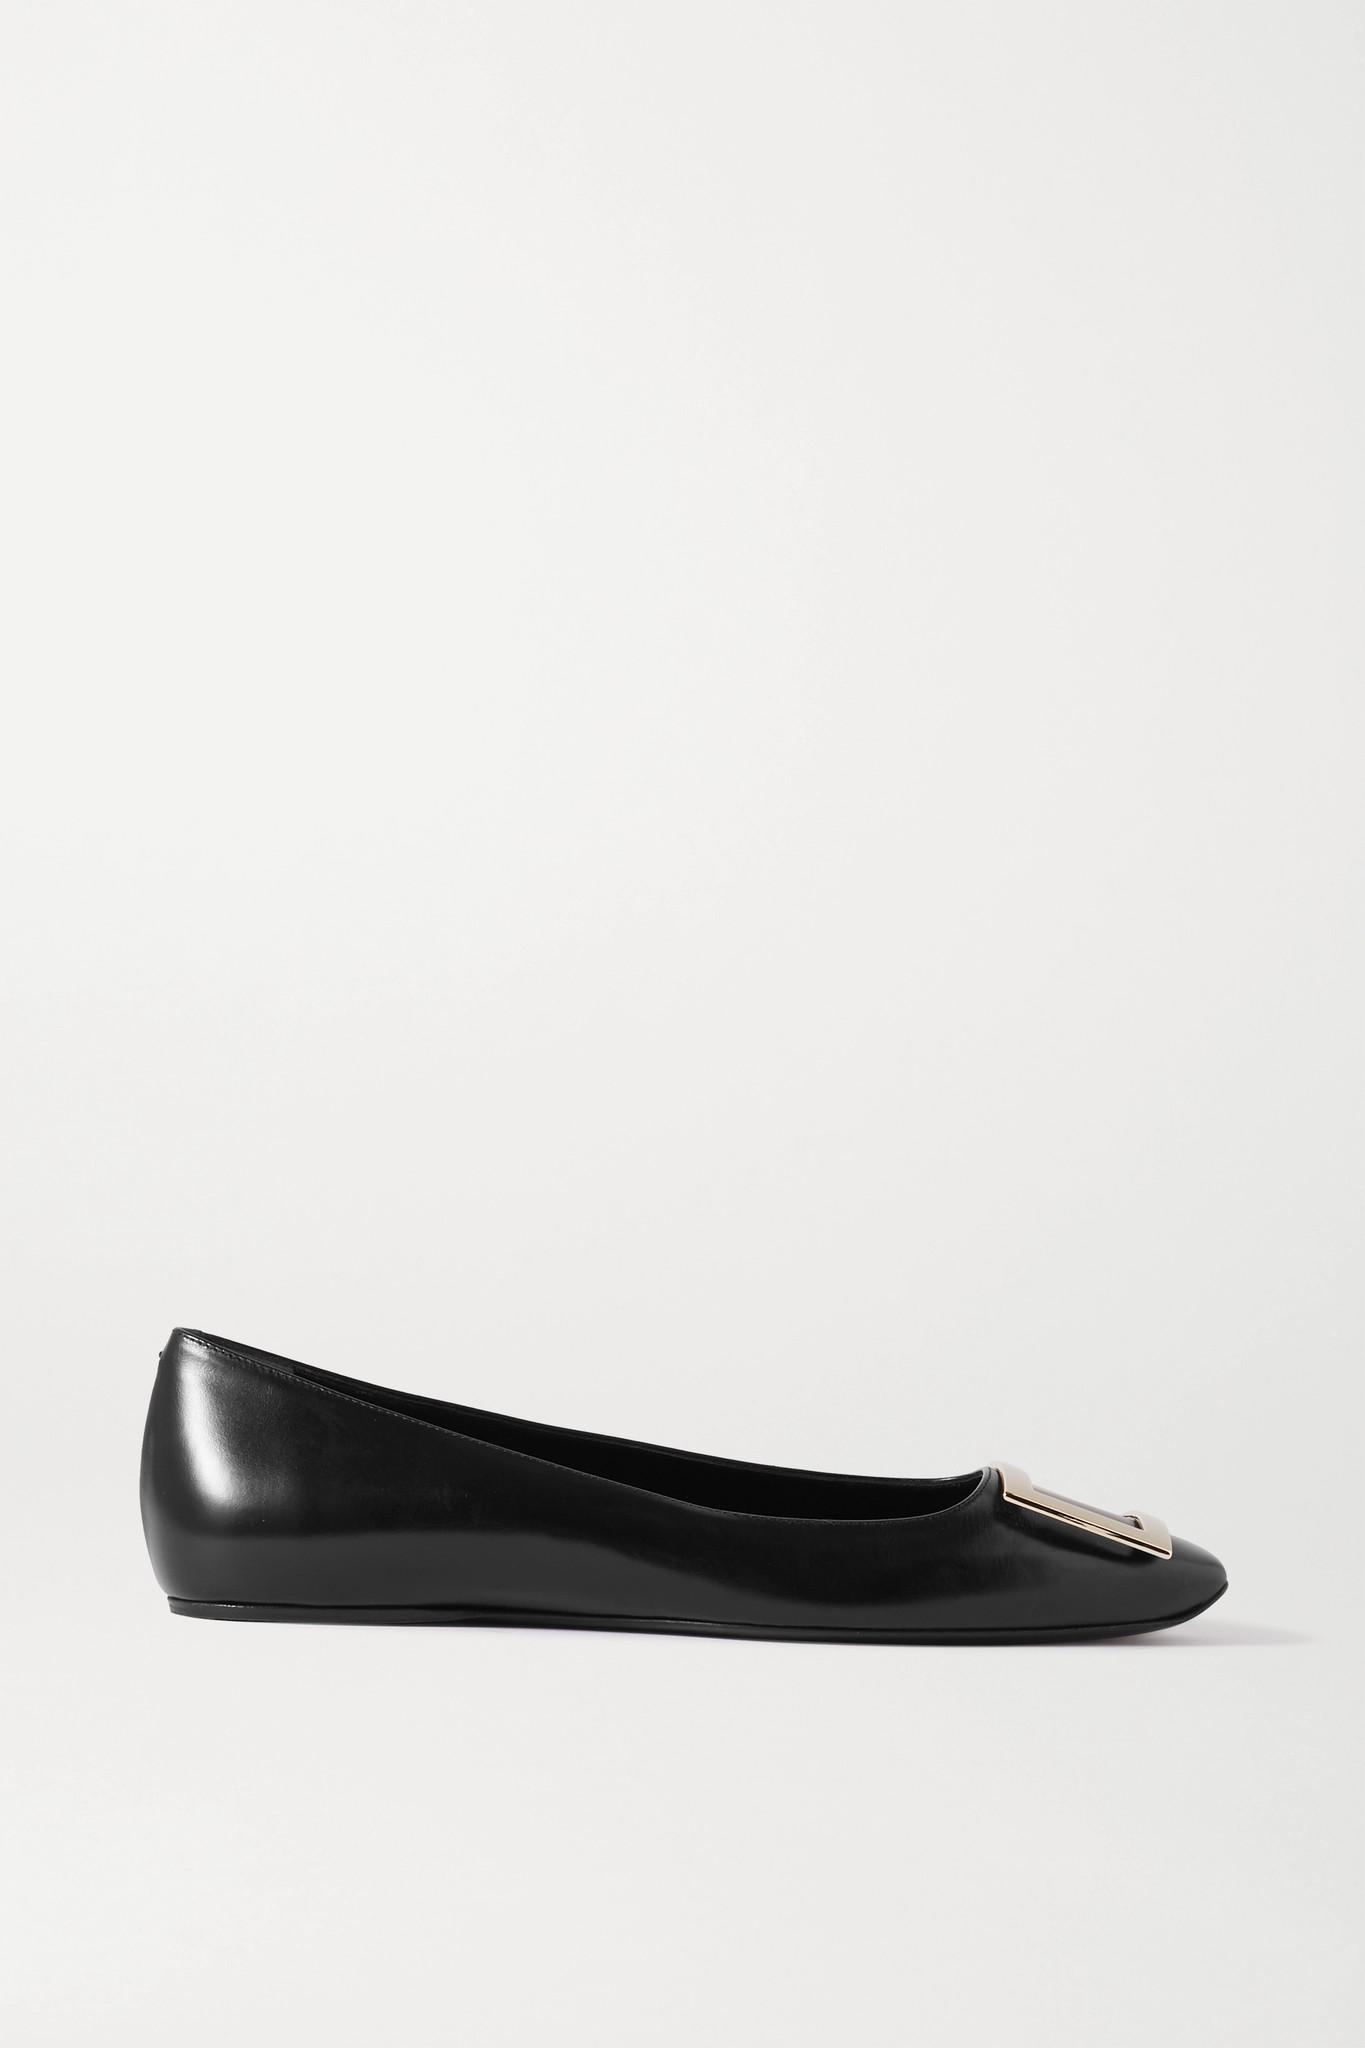 ROGER VIVIER - Trompette Bellerine Glossed-leather Ballet Flats - Black - IT35